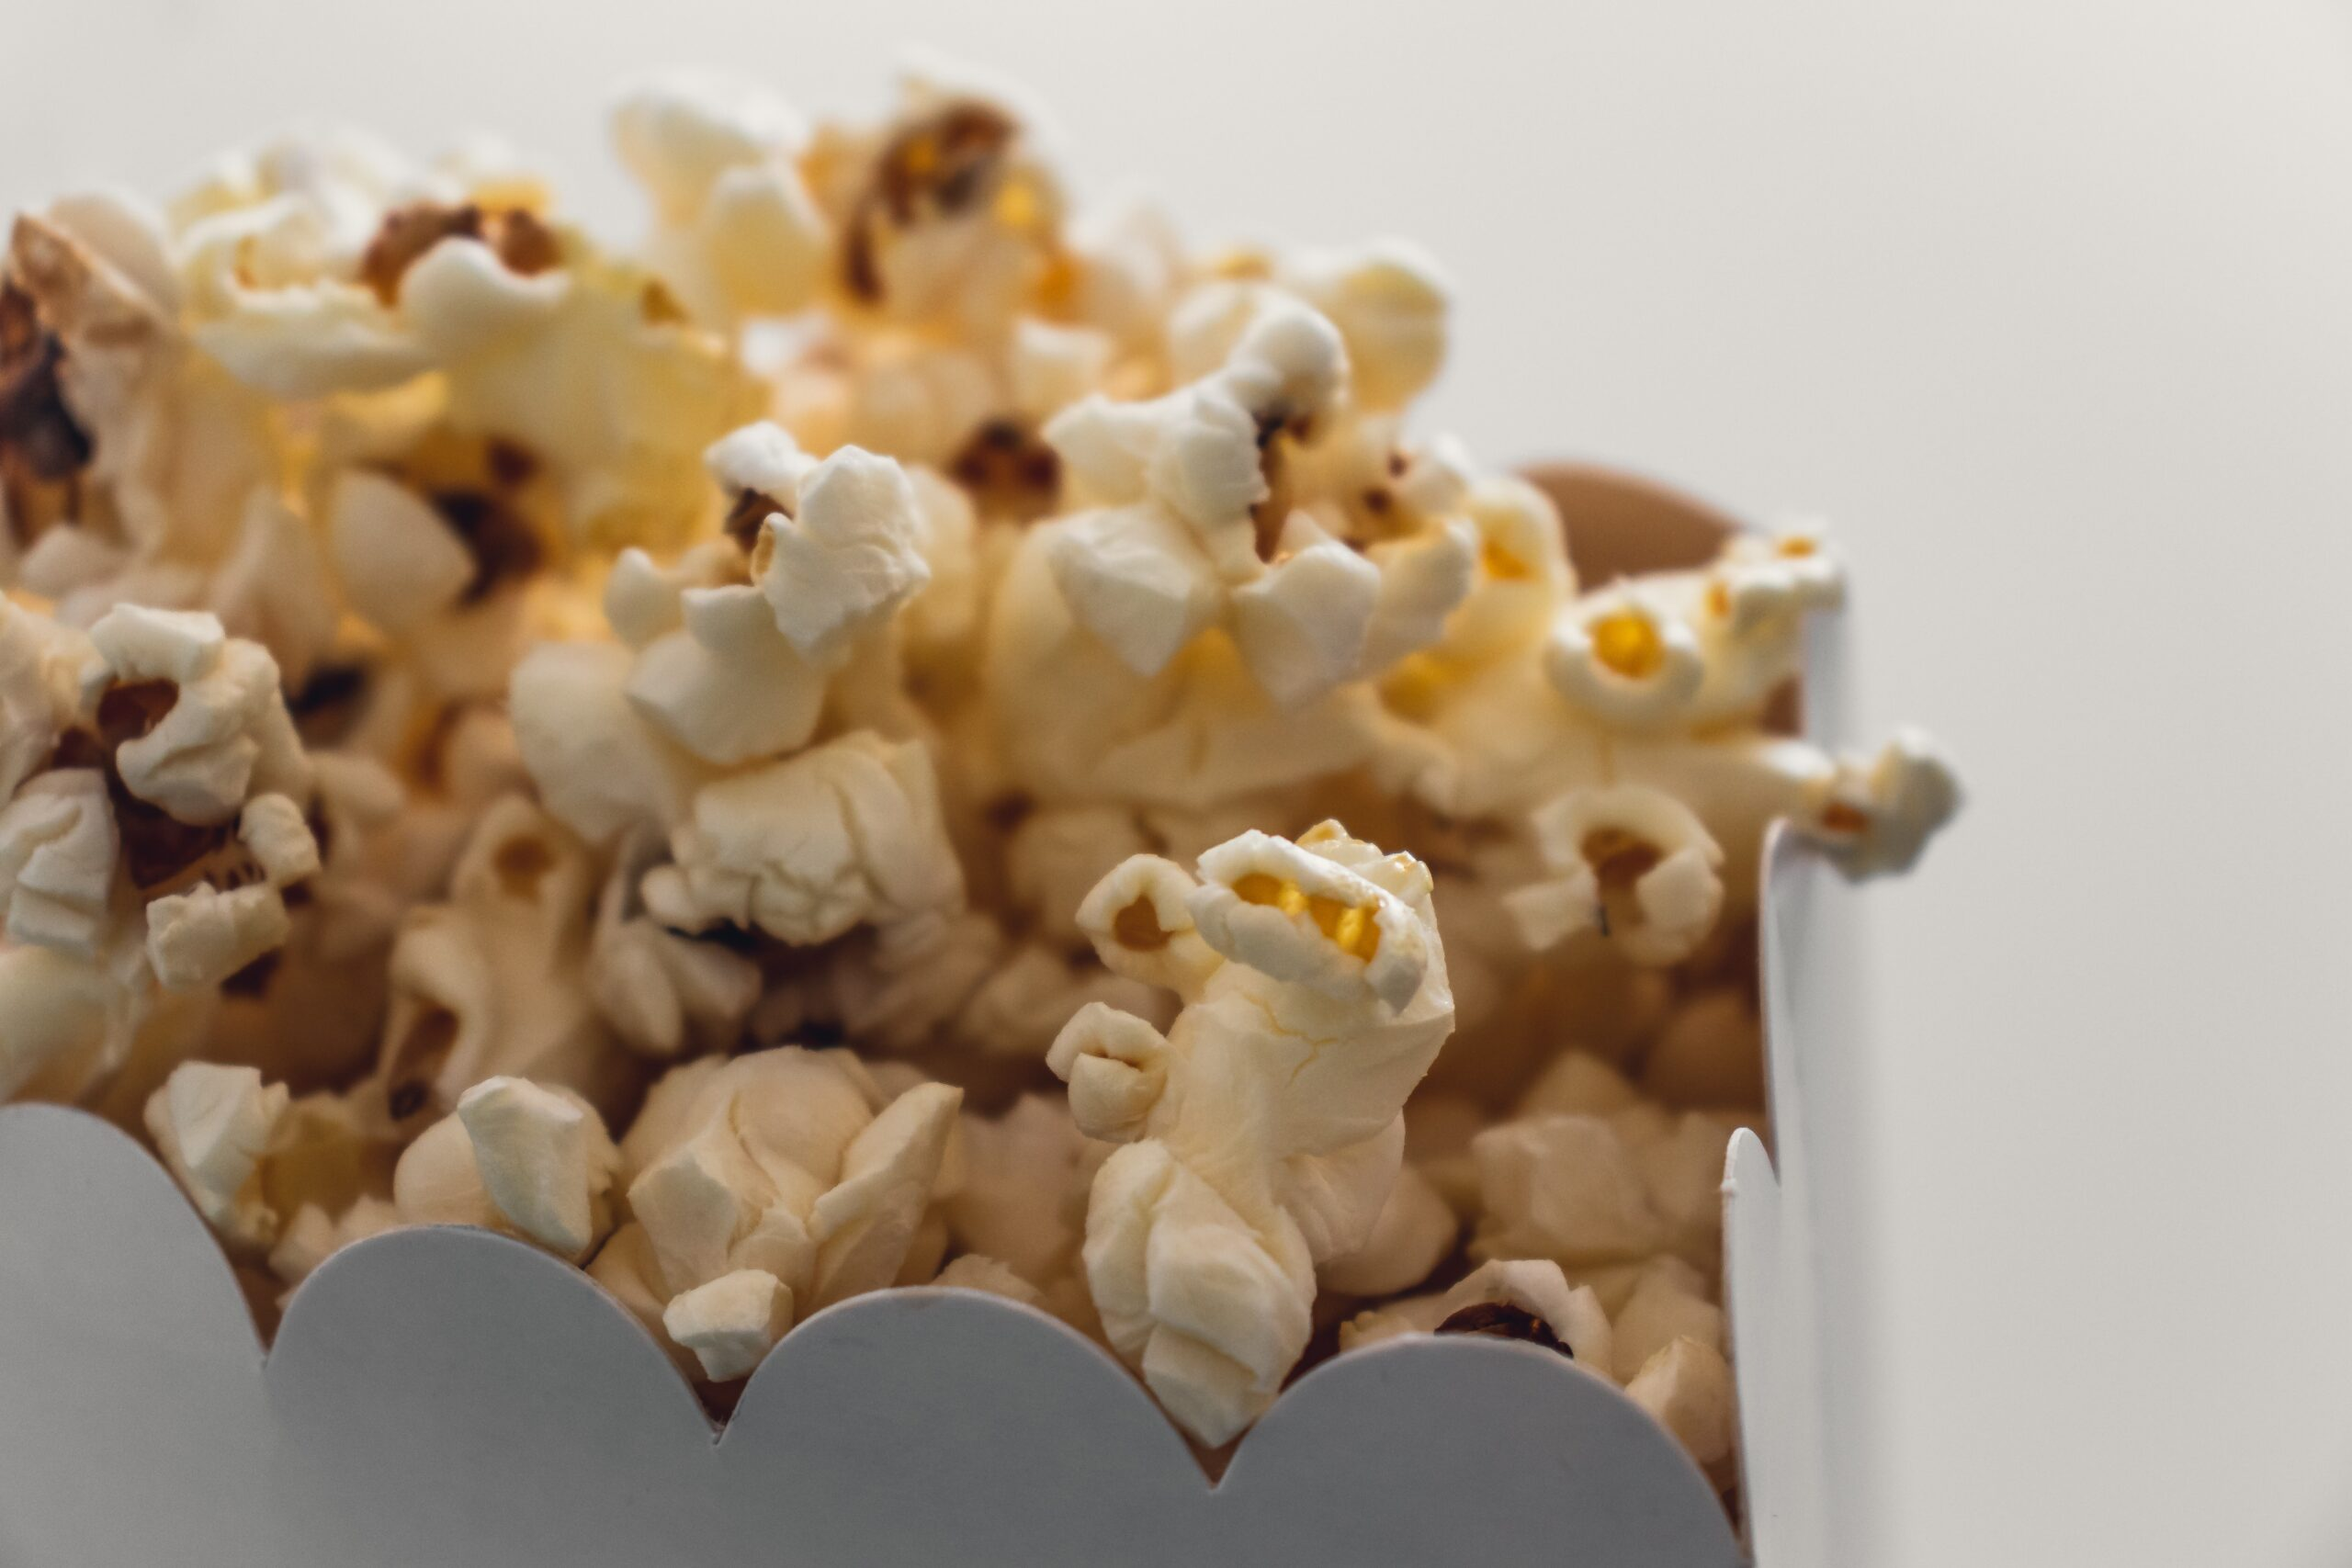 Stovetop Popcorn Recipe - Latch onto Health